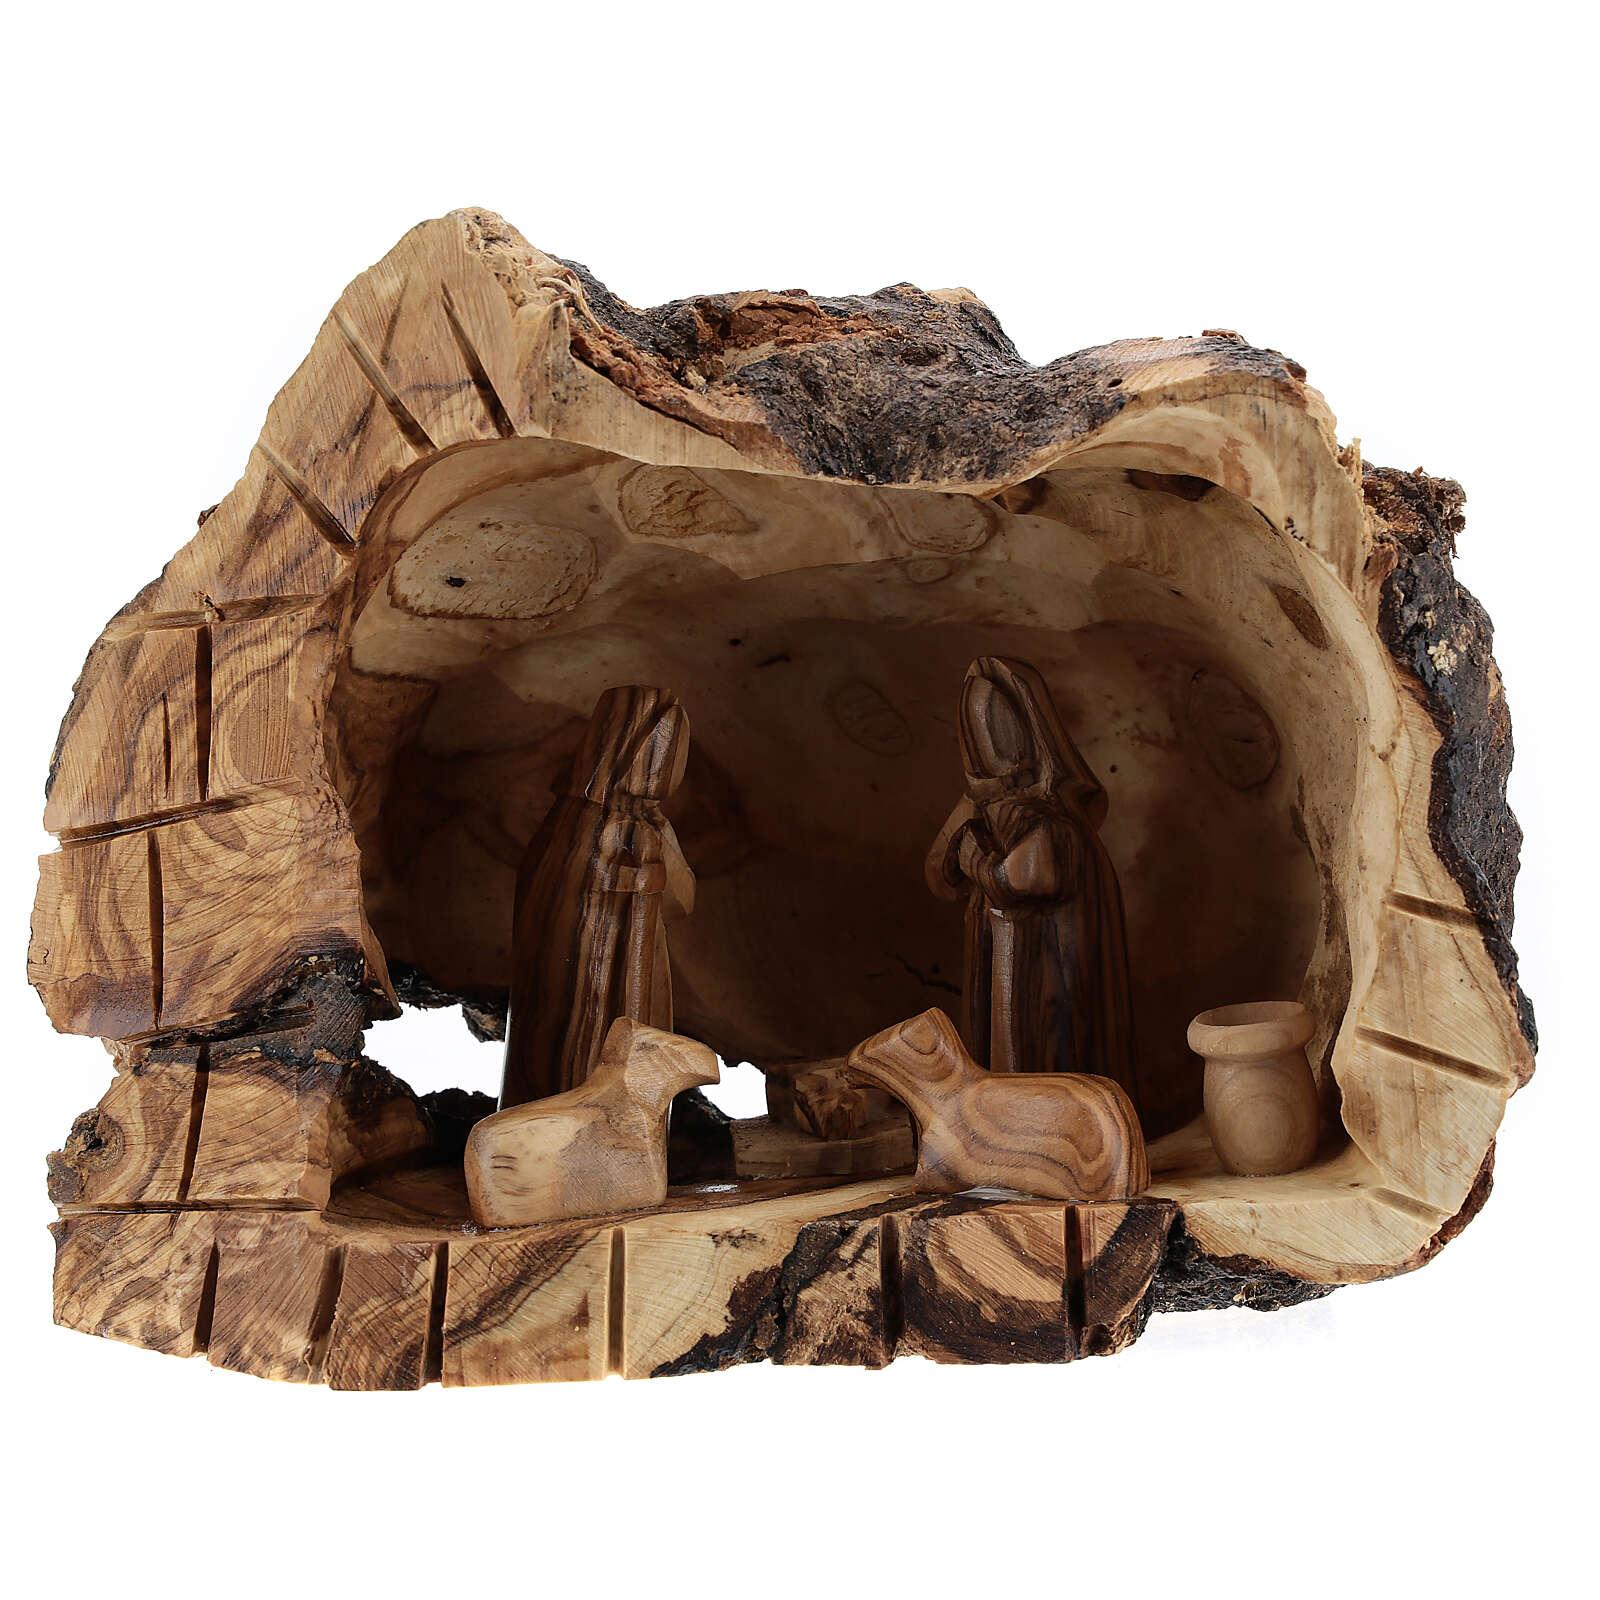 Cueva madera natural Natividad 6 cm olivo Belén 15x20x10 cm 4